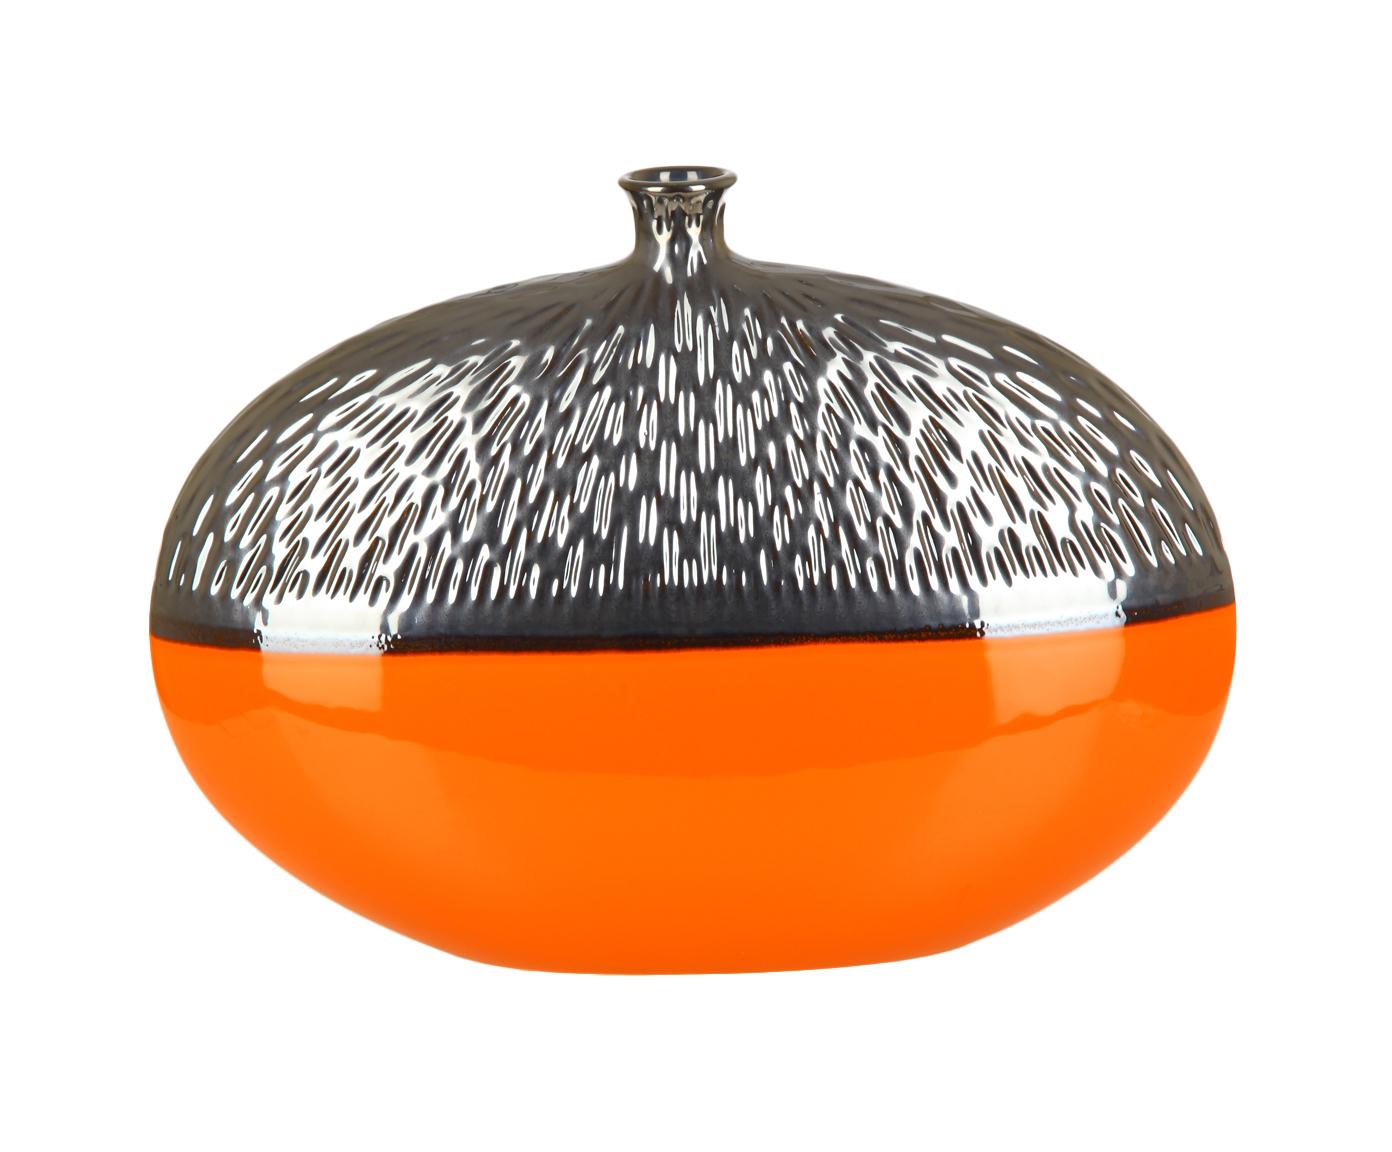 Вазы настольные Элитная ваза декоративная Copperfield большая оранжевая от Sporvil vaza-dekorativnaya-bolshaya-copperfield-serebro-s-oranzhevym-ot-sporvil-portugaliya.jpg